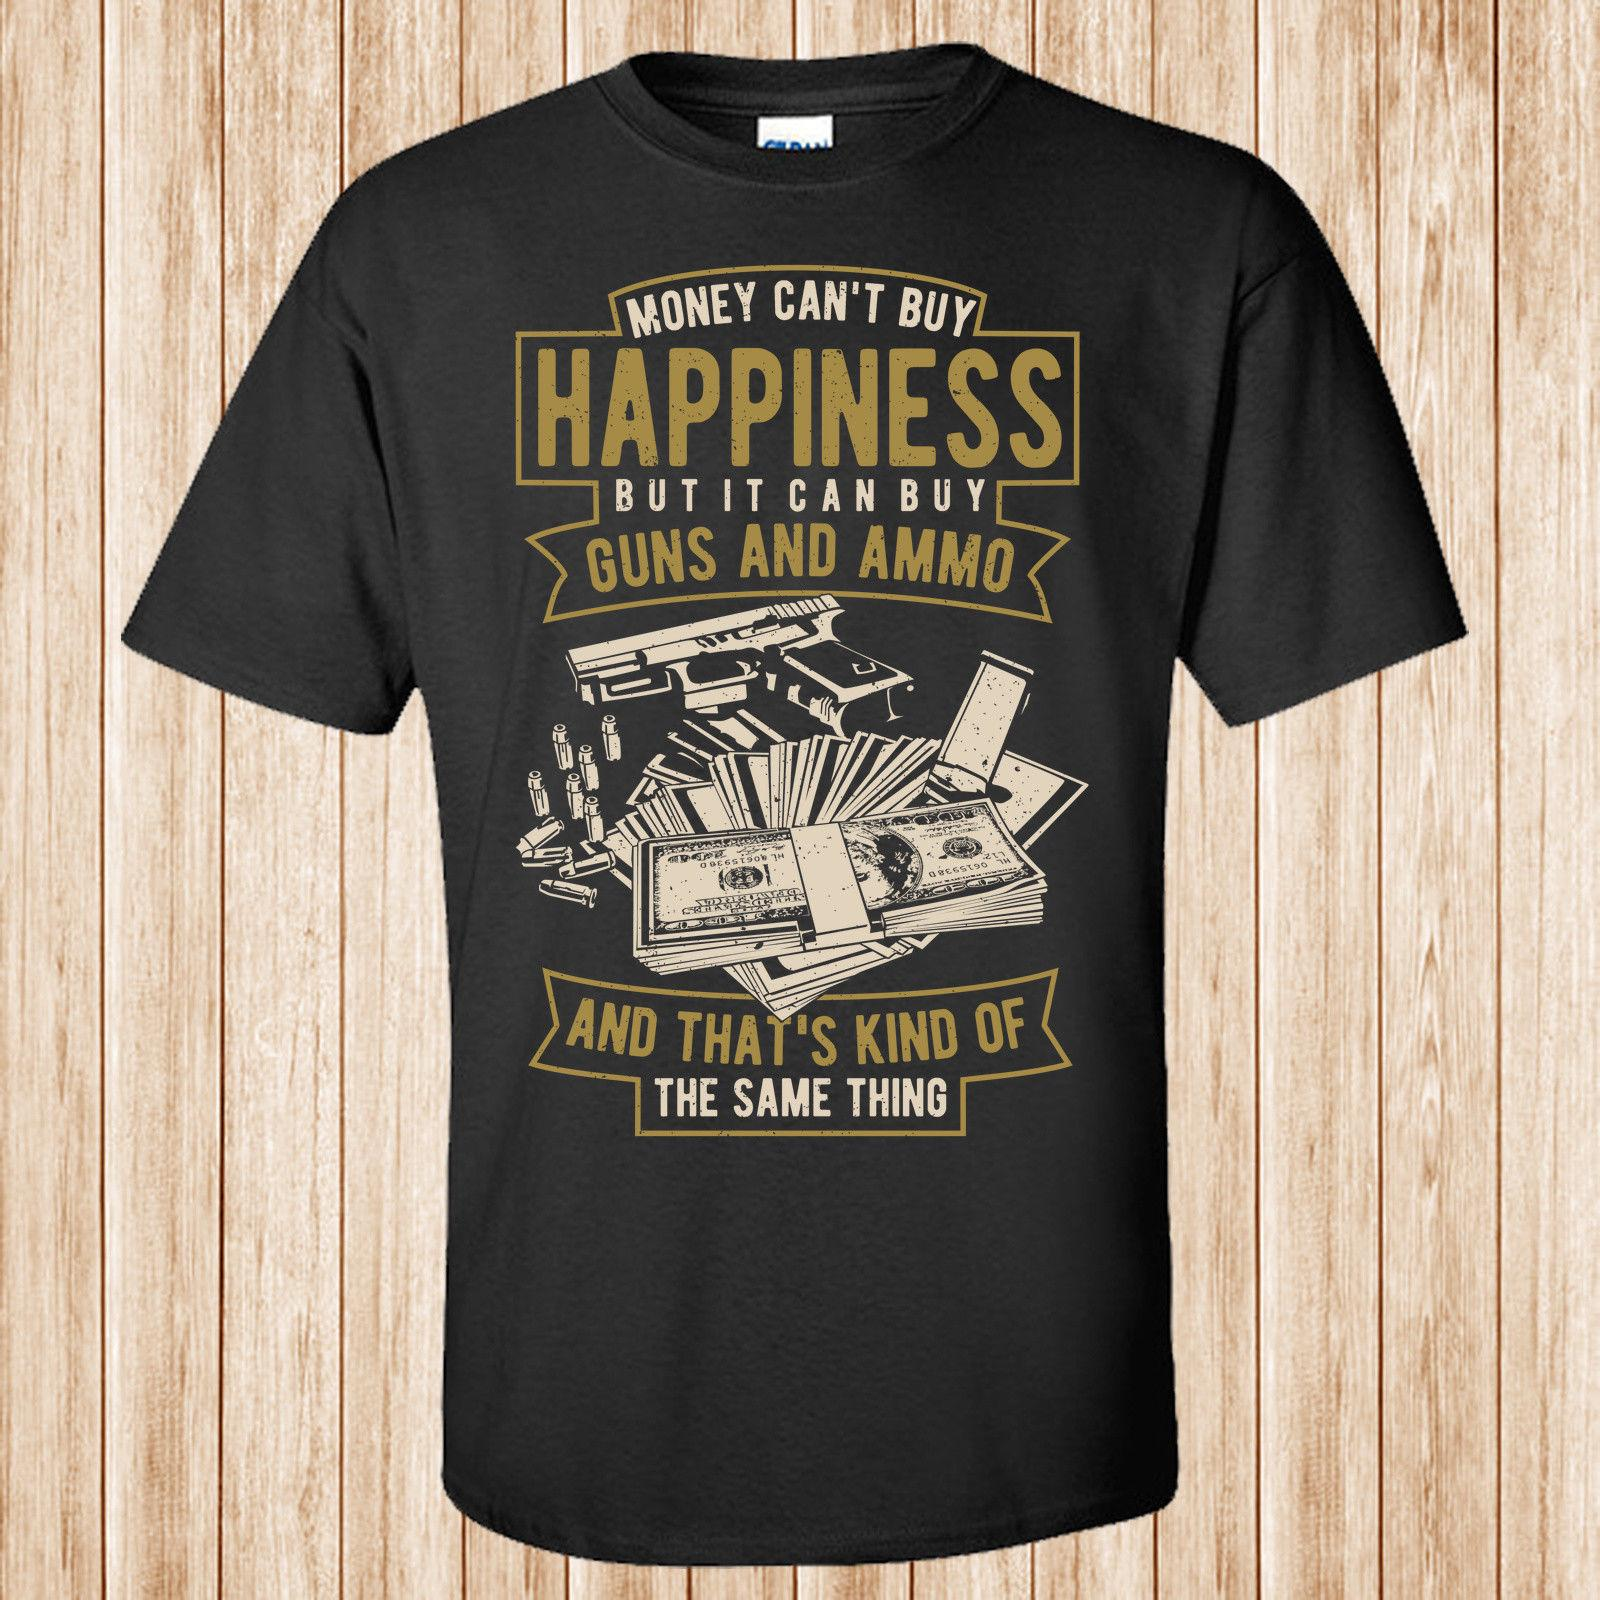 e04fbe4dd Sleeves Boy Cotton Men T Shirt Money Can'T Buy Happiness T Shirt Buy T Shirt  Designs Printing Tee Shirts From Tshirtemperor31, $11.63| DHgate.Com